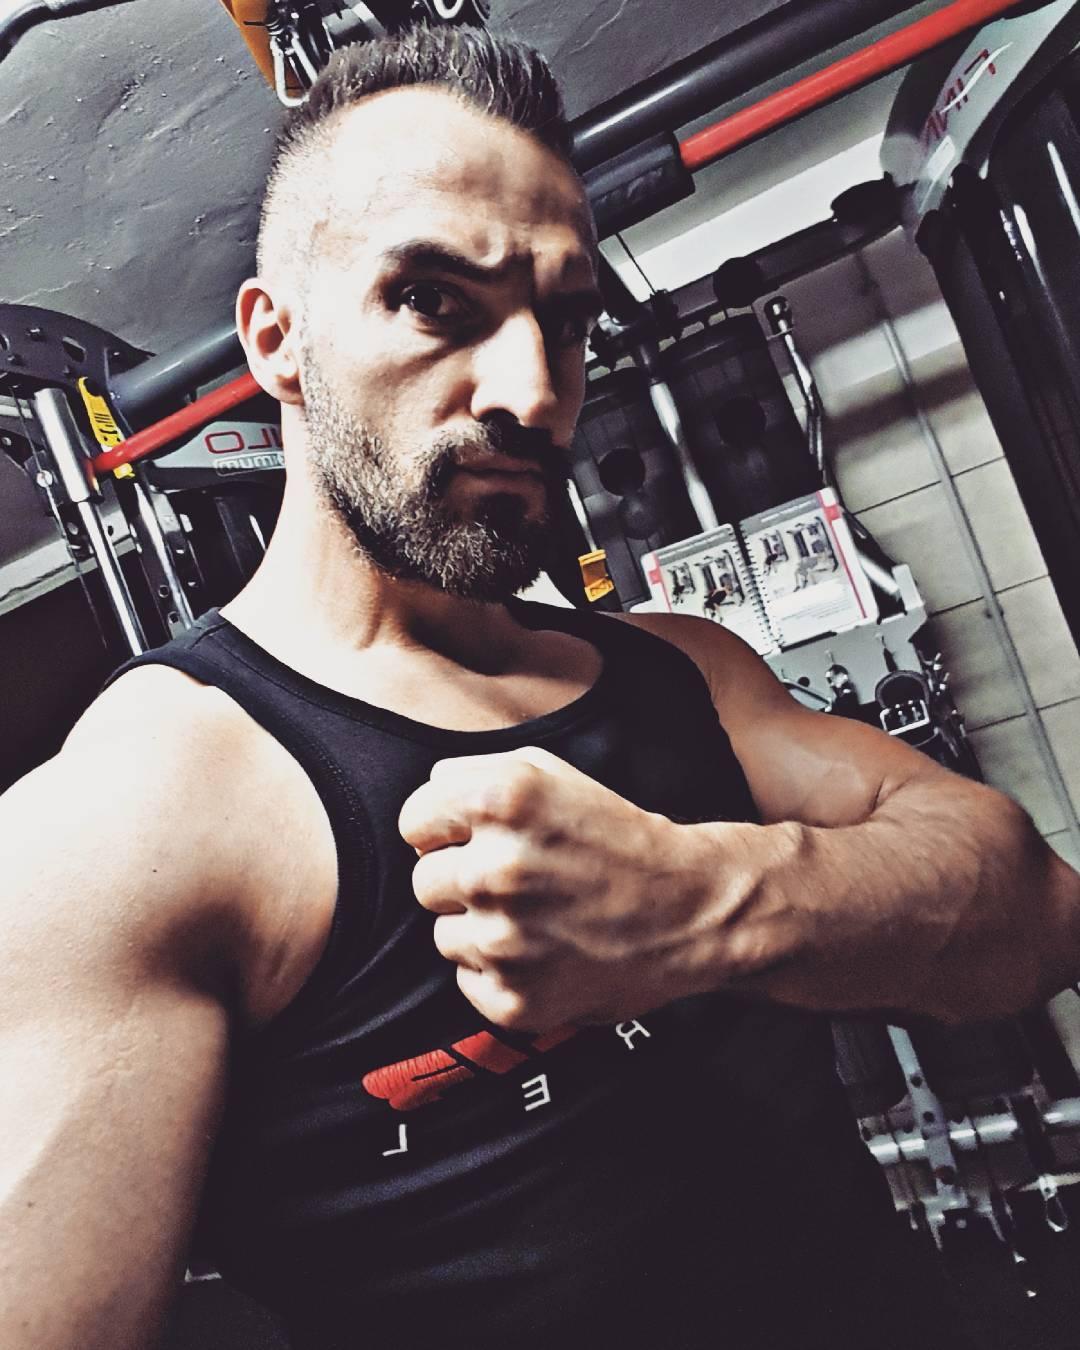 Ready 2 Rumble!!! #tv #dreharbeiten #vorbereitung #nextbigthing #bangboss #fitness #fit #fitfam #bodybuilding #selfie #me #mcfit #superfit #crunchfit #fitnessfirst #motivation #sport #lifestyle #body #muscles #muskeln #pump #pumped #german #berlin #gym #homegym #nopainnogain #pusher